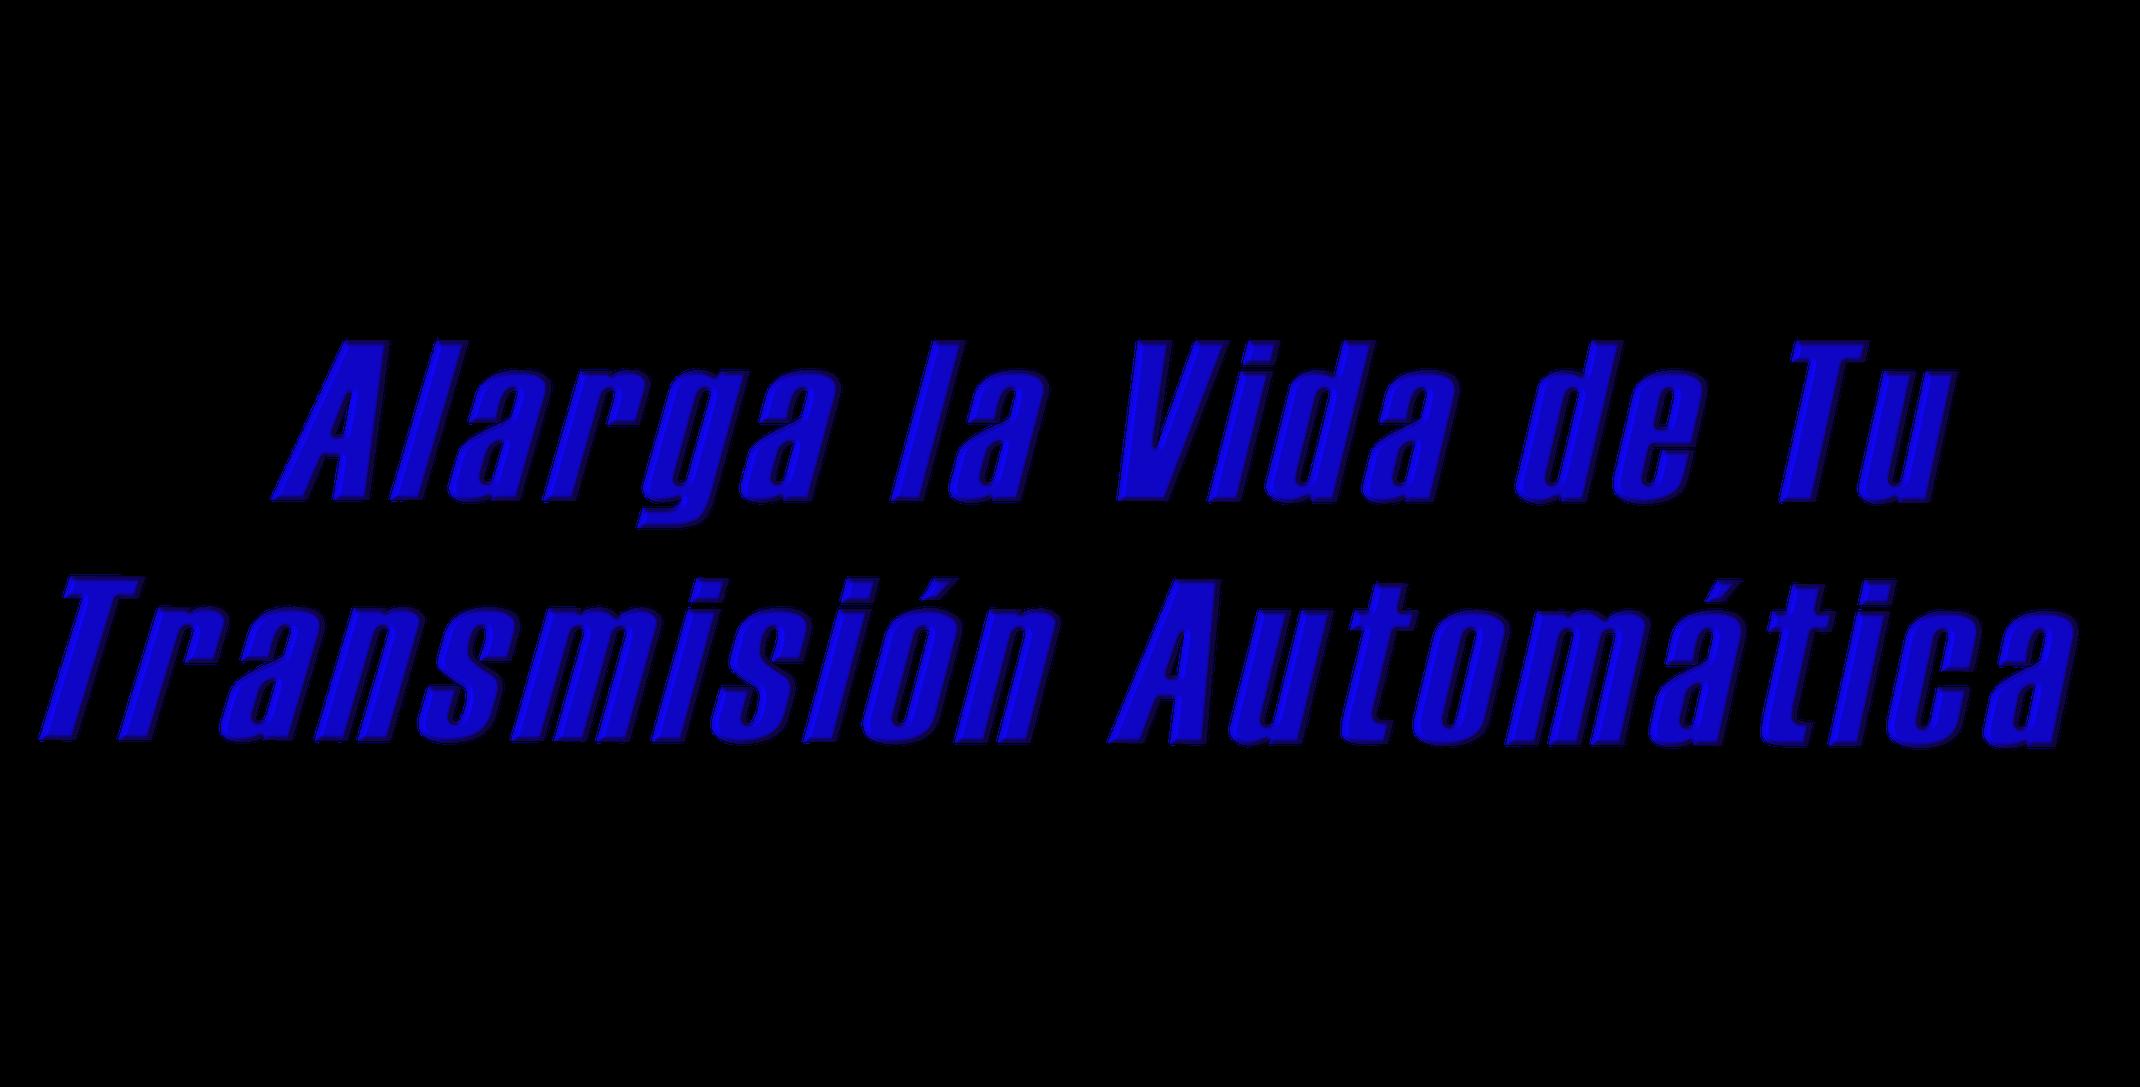 Mantenimiento Preventivo Para Transmision Automatica